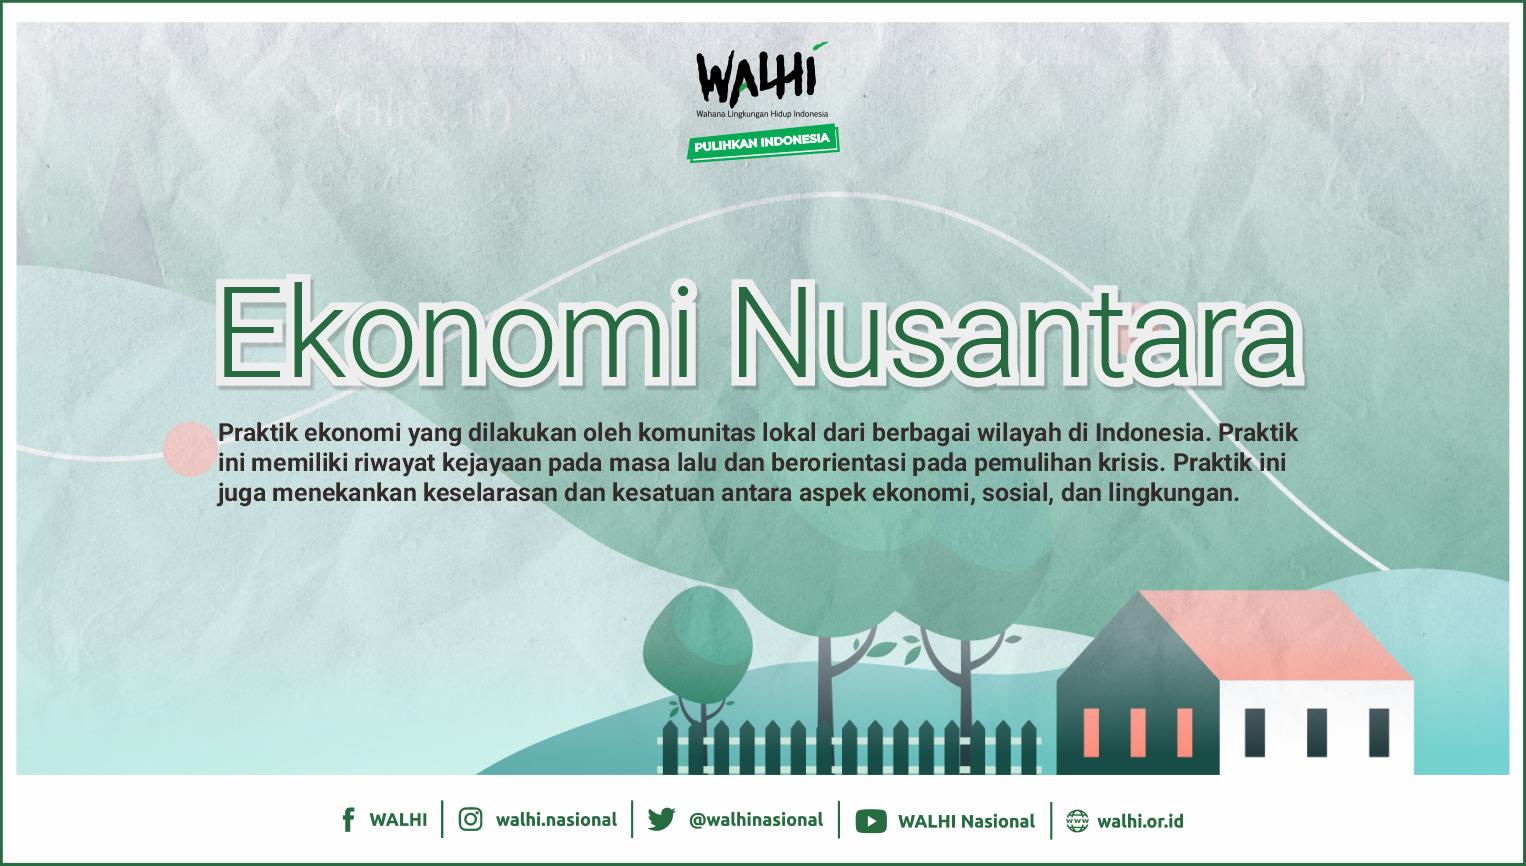 Ekonomi Nusantara